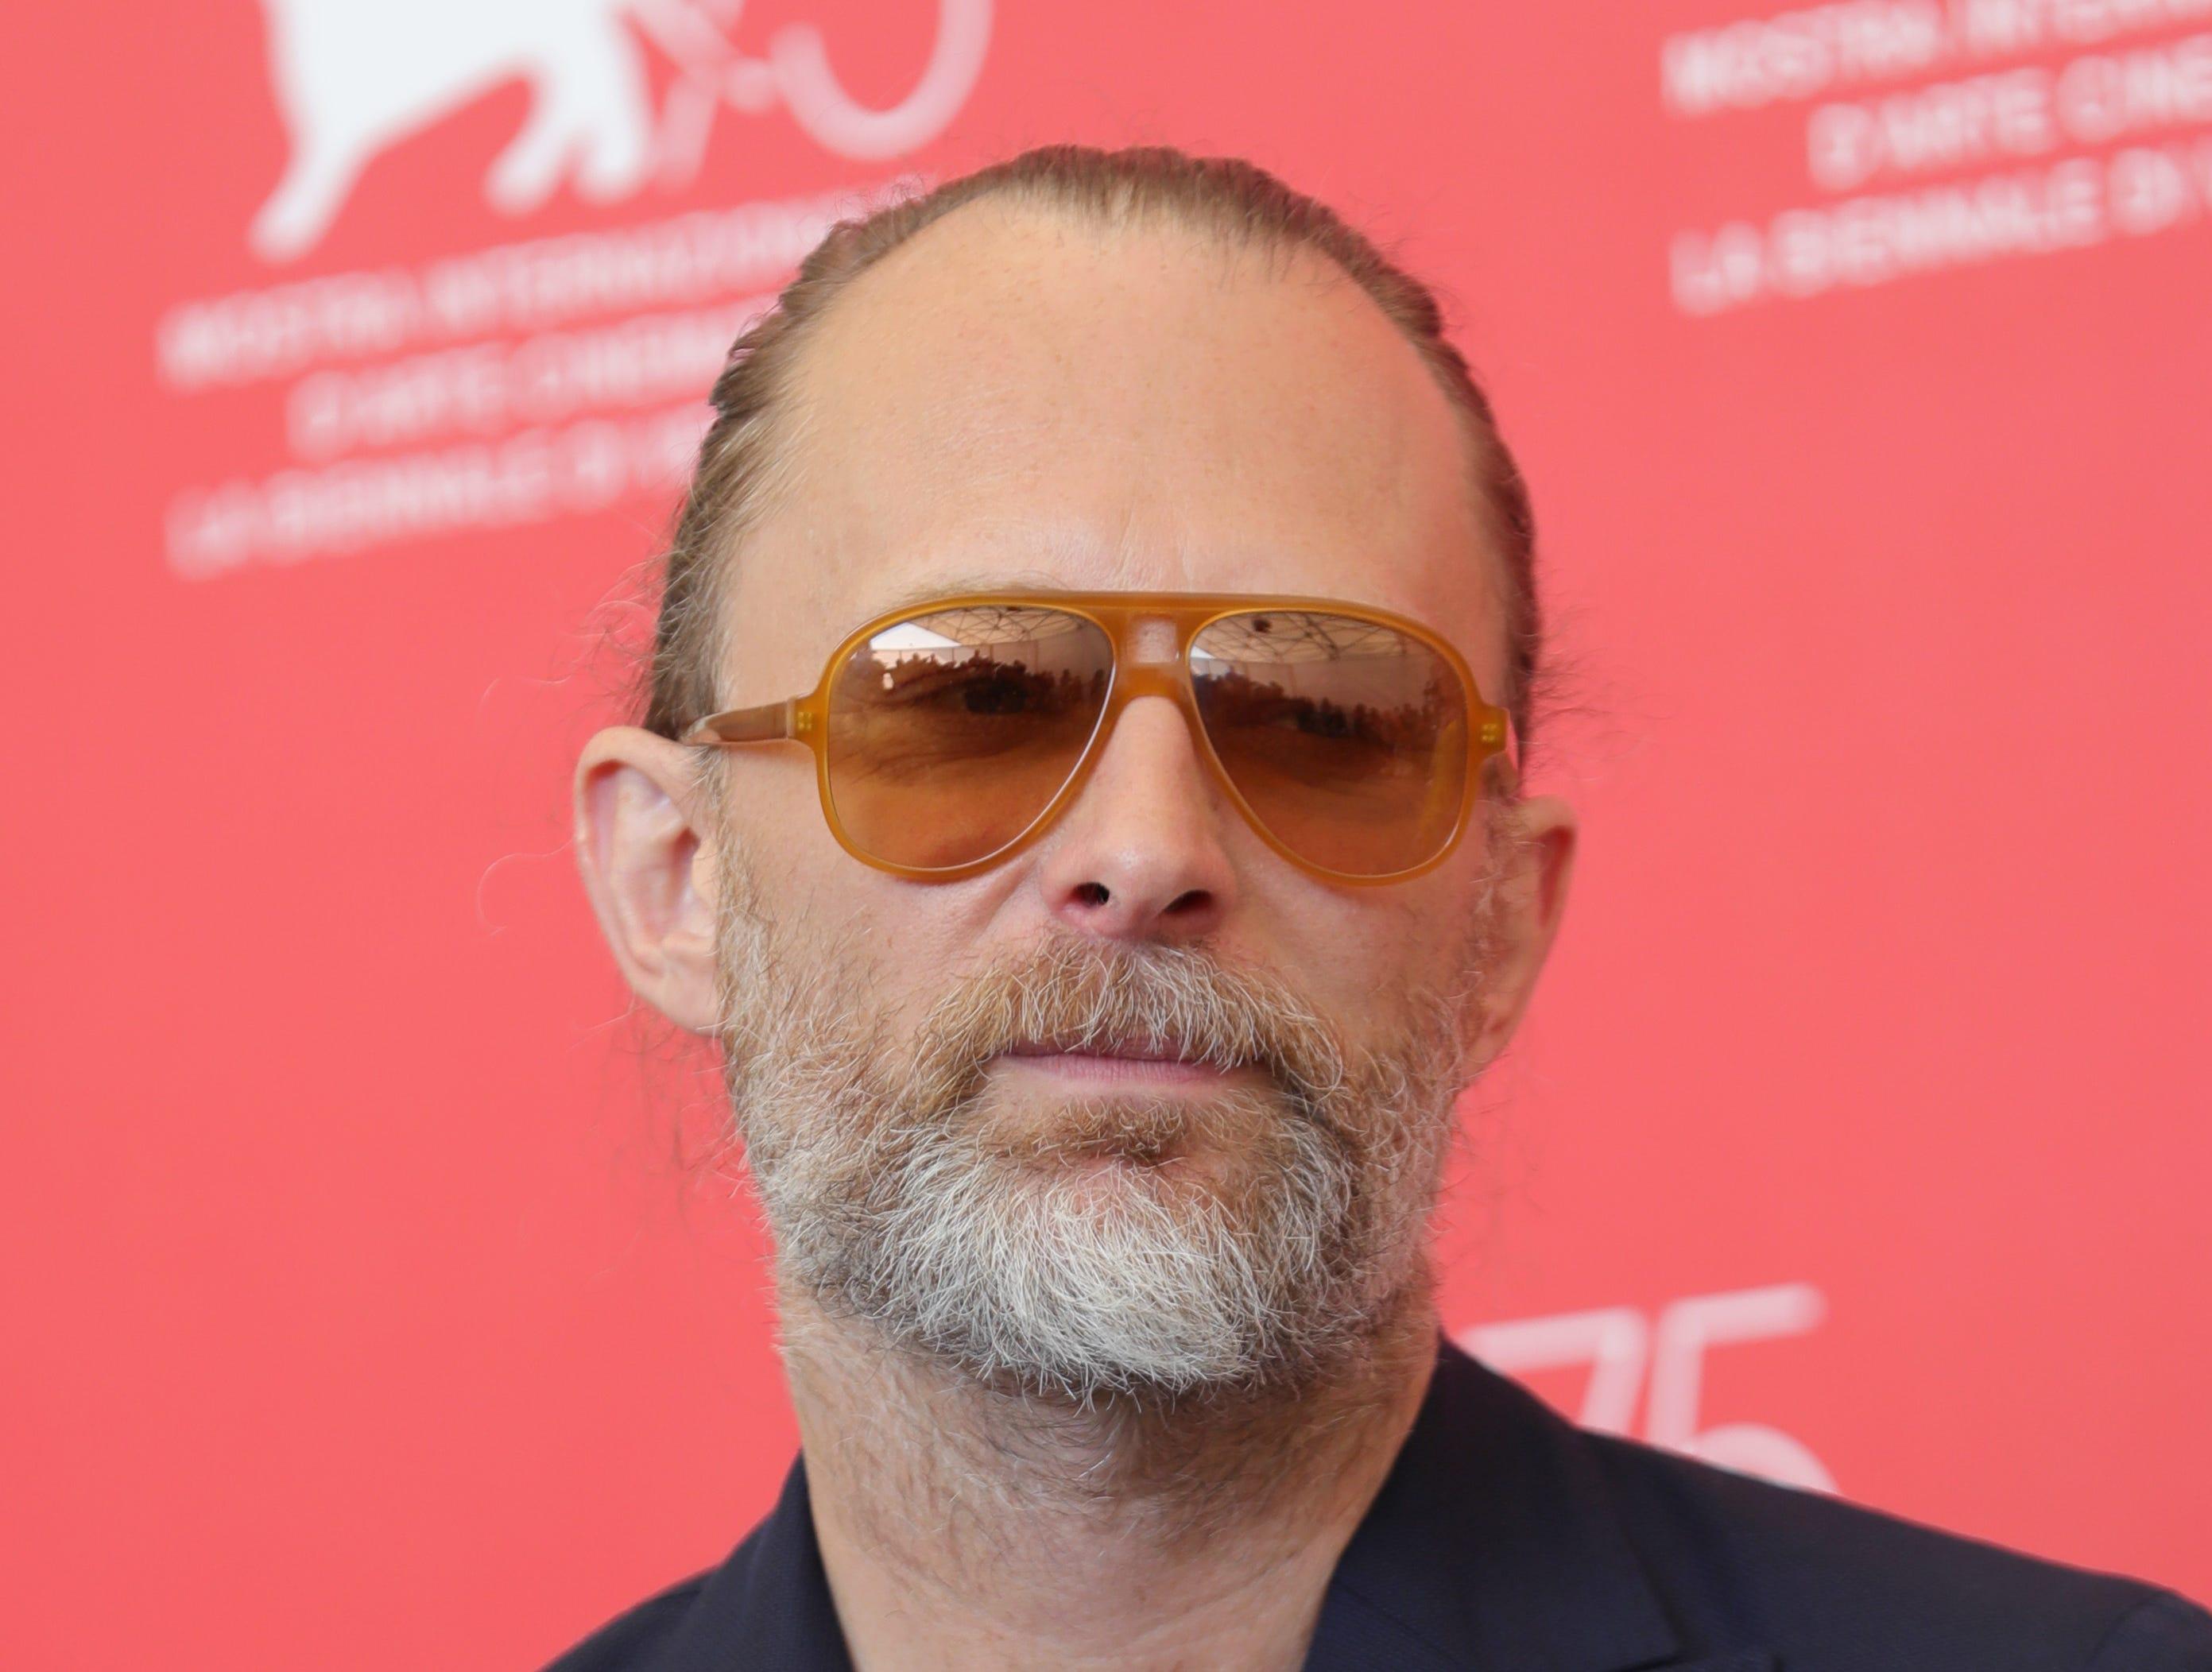 And musician Thom Yorke of Radiohead.